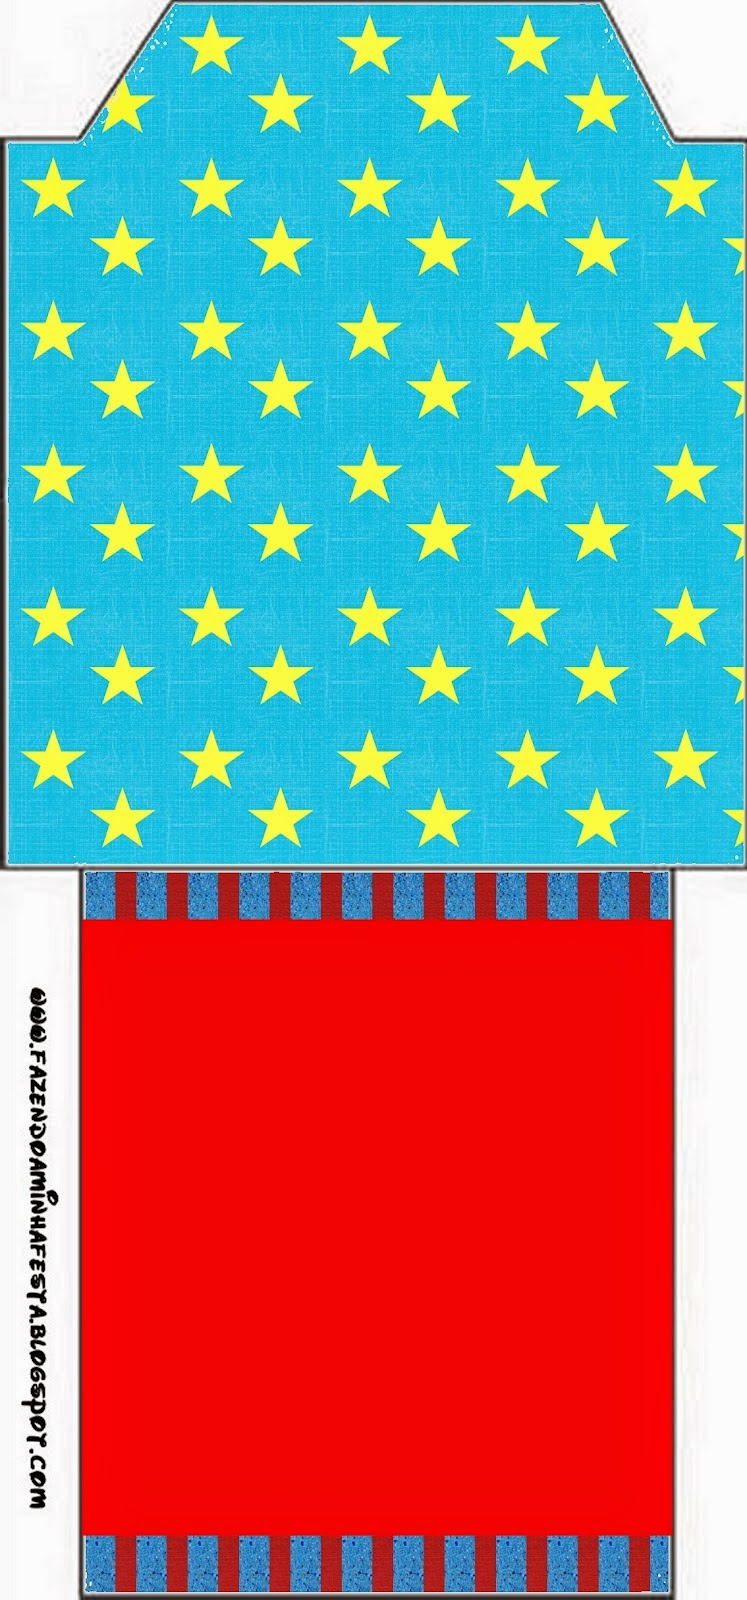 Bolsita de Té para imprimir gratis de Estrellas sobre Fondo Celeste.